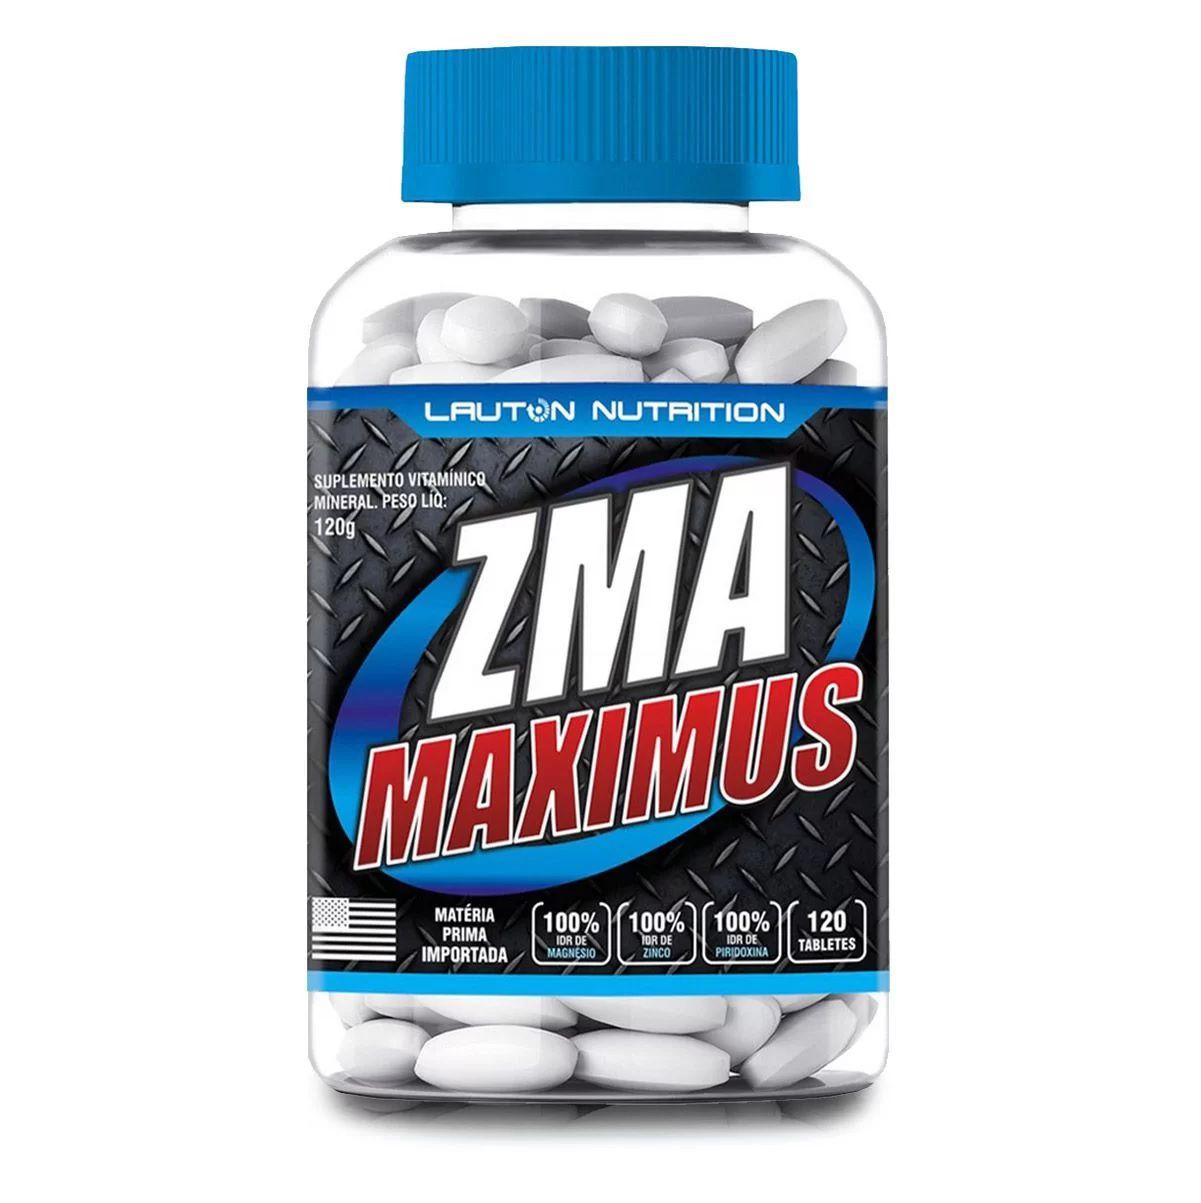 ZMA Maximus Lauton Nutrition - 120 Tablets 1G